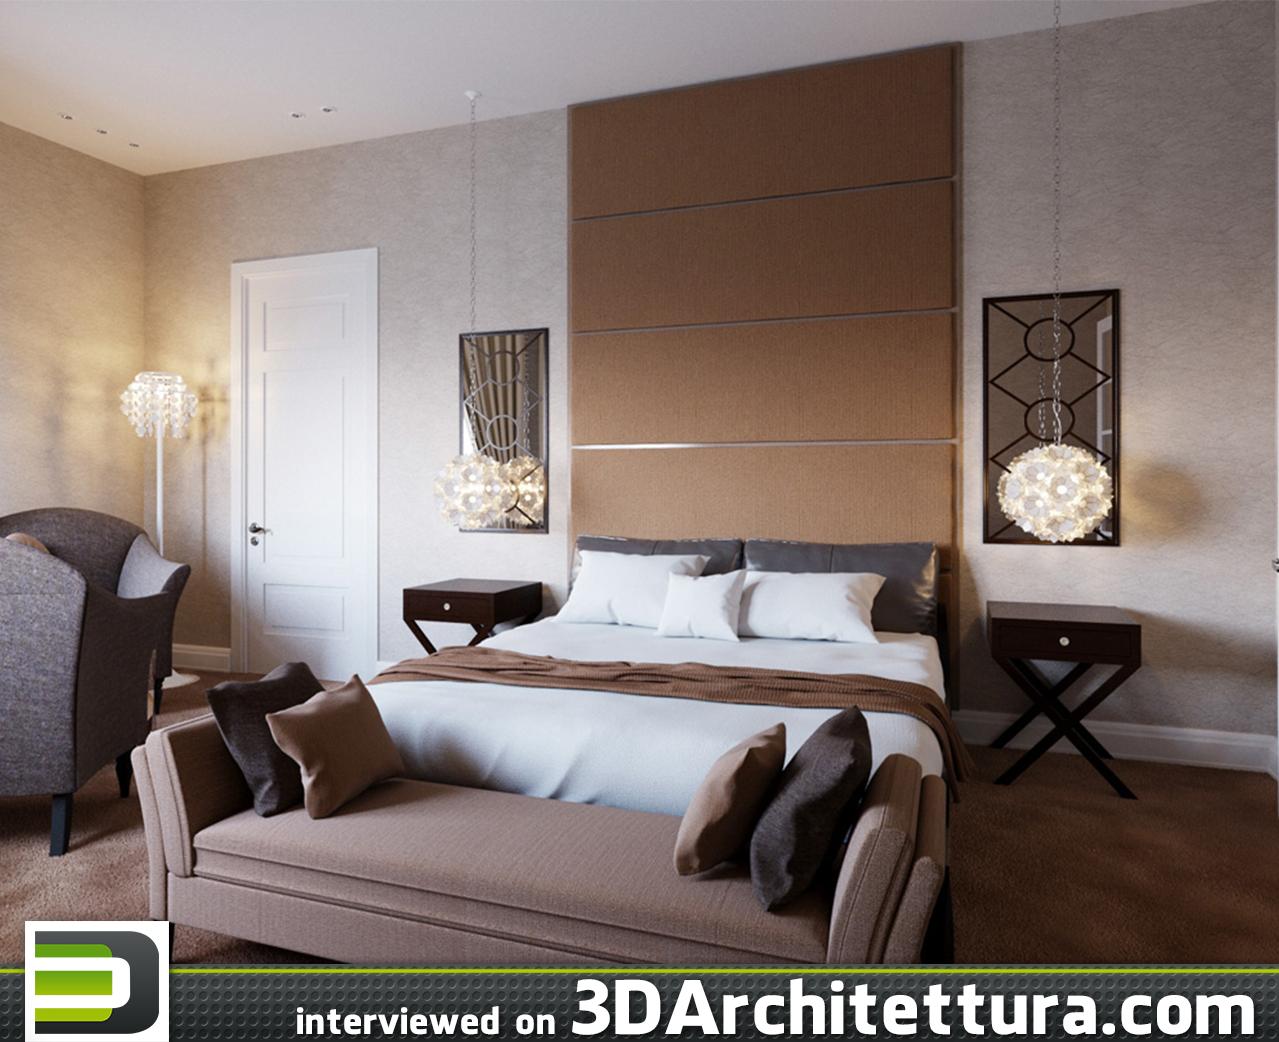 Viacheslav Serbov, freelance CG artist fro Ukraine interviewed on 3DArchitettura about rendering and visualization